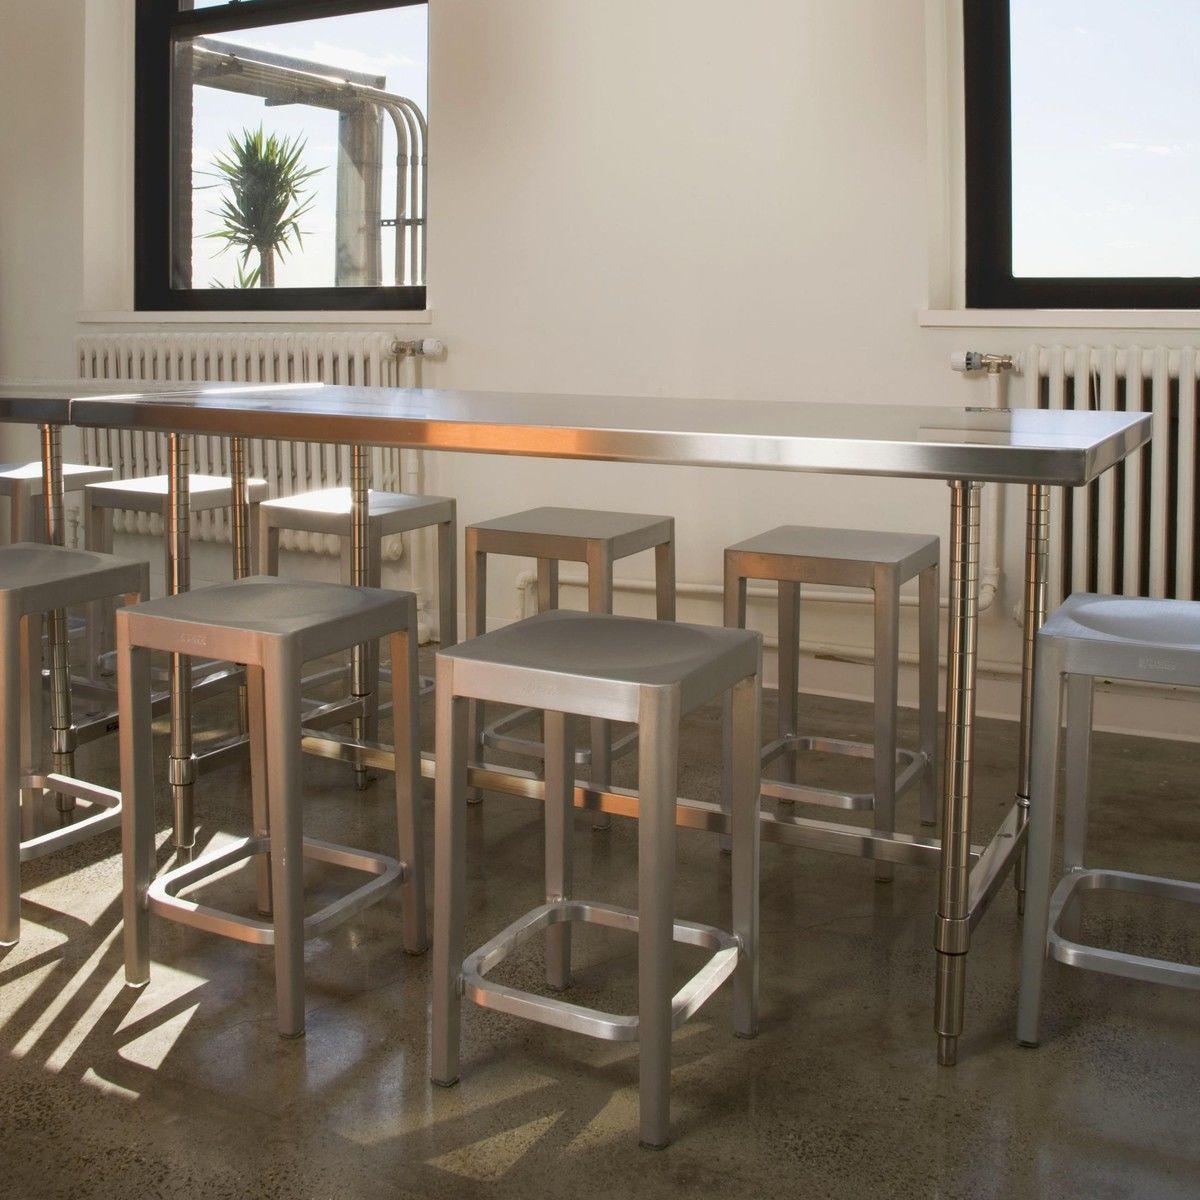 emeco barstool tabouret de bar emeco. Black Bedroom Furniture Sets. Home Design Ideas